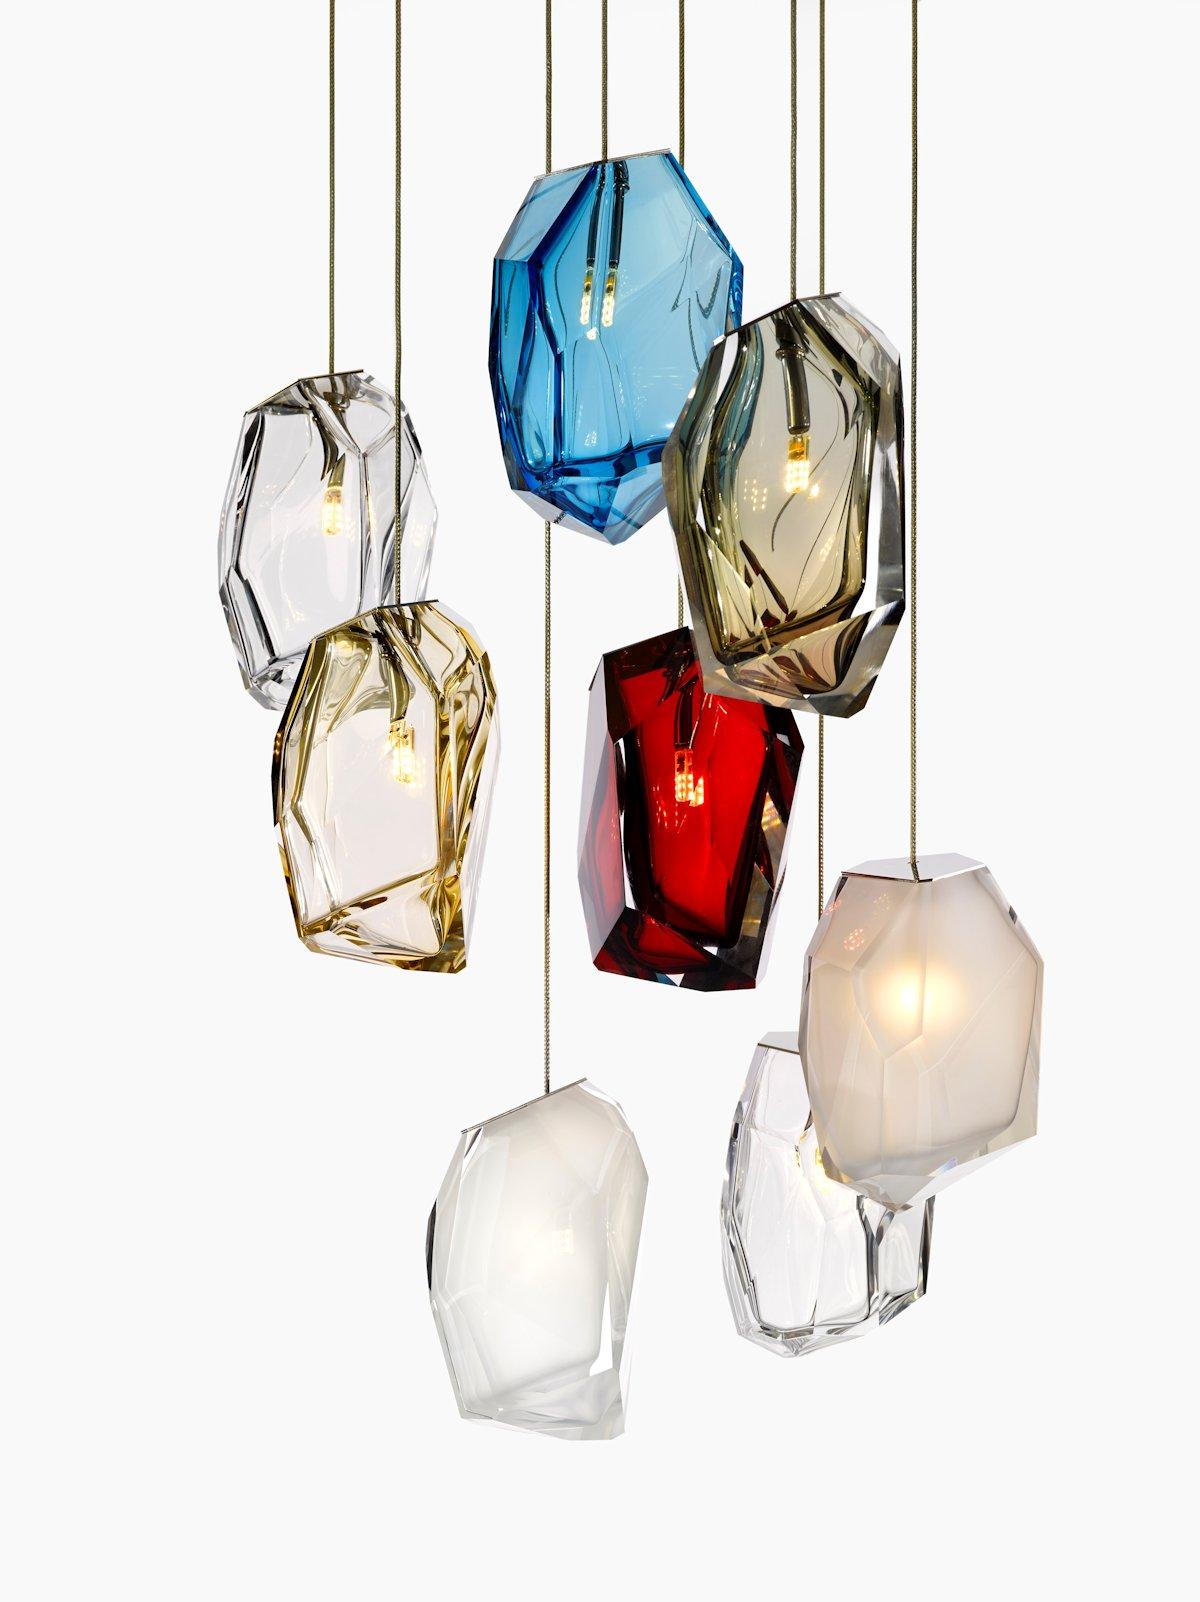 Arik Levi, дизайнер Арик Леви, Арик Леви, Lasvit, каталог Lasvit, светильник Lasvit, Crystal Rock, светильник Crystal Rock, дизайнерский светильник